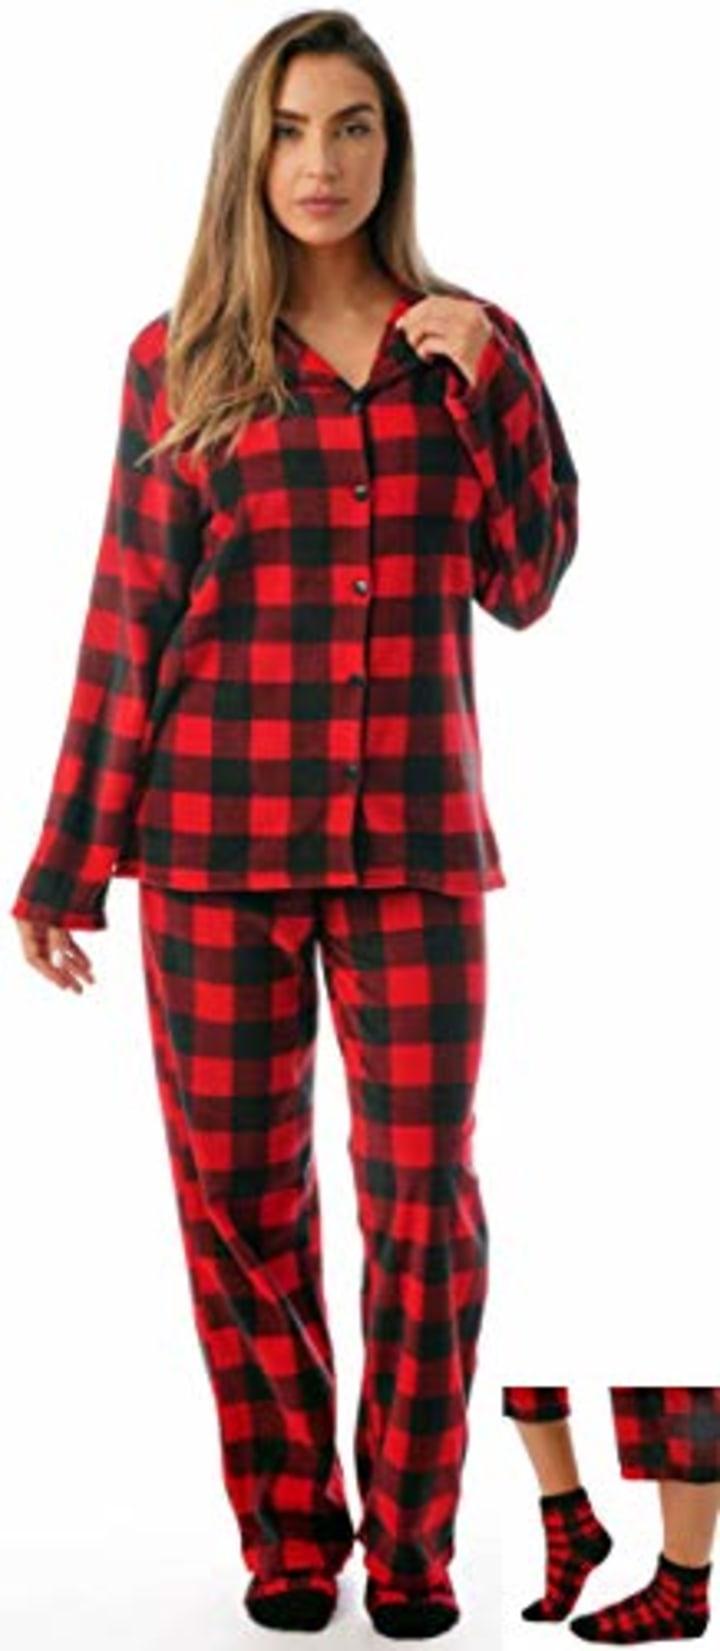 Pijama Women/'s Pyjama Nightwear Ladies Girls Pjs Nighties Nightdress New Star